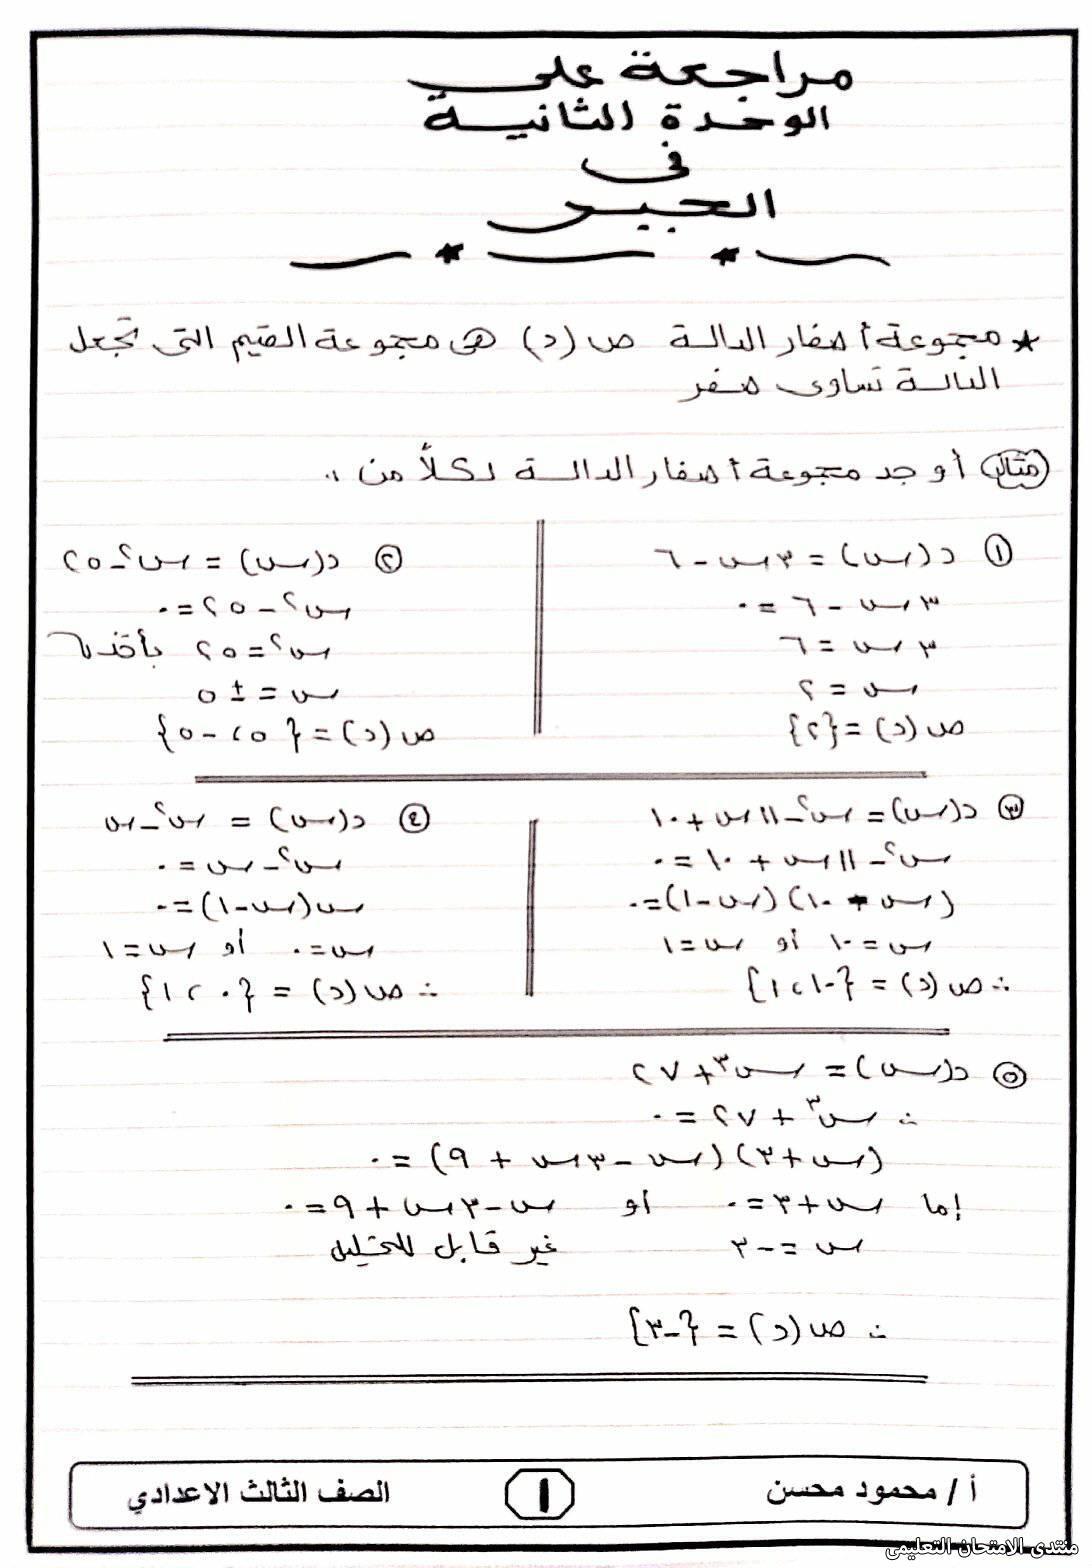 exam-eg.com_162035653487631.jpg